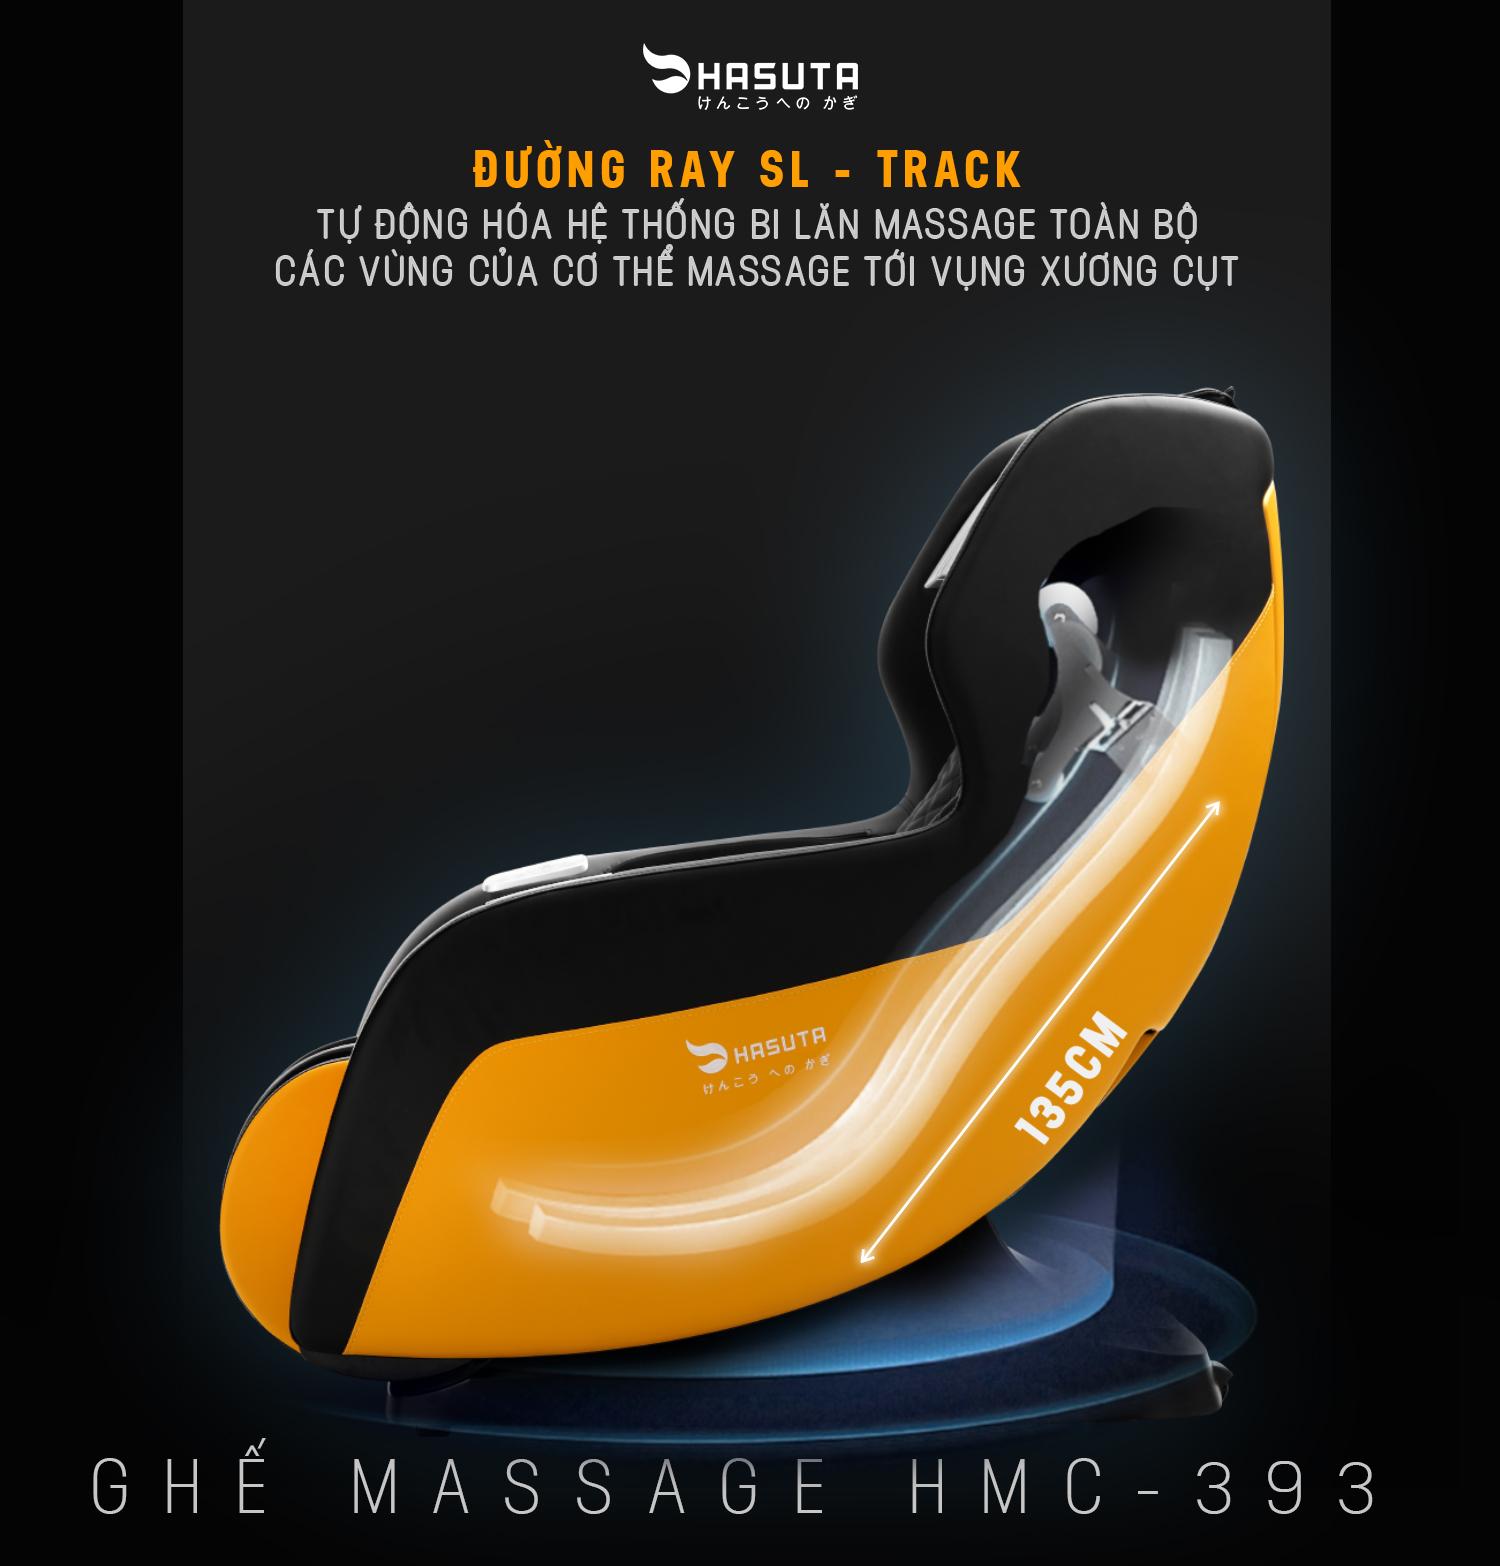 ghe massage hmc- 393